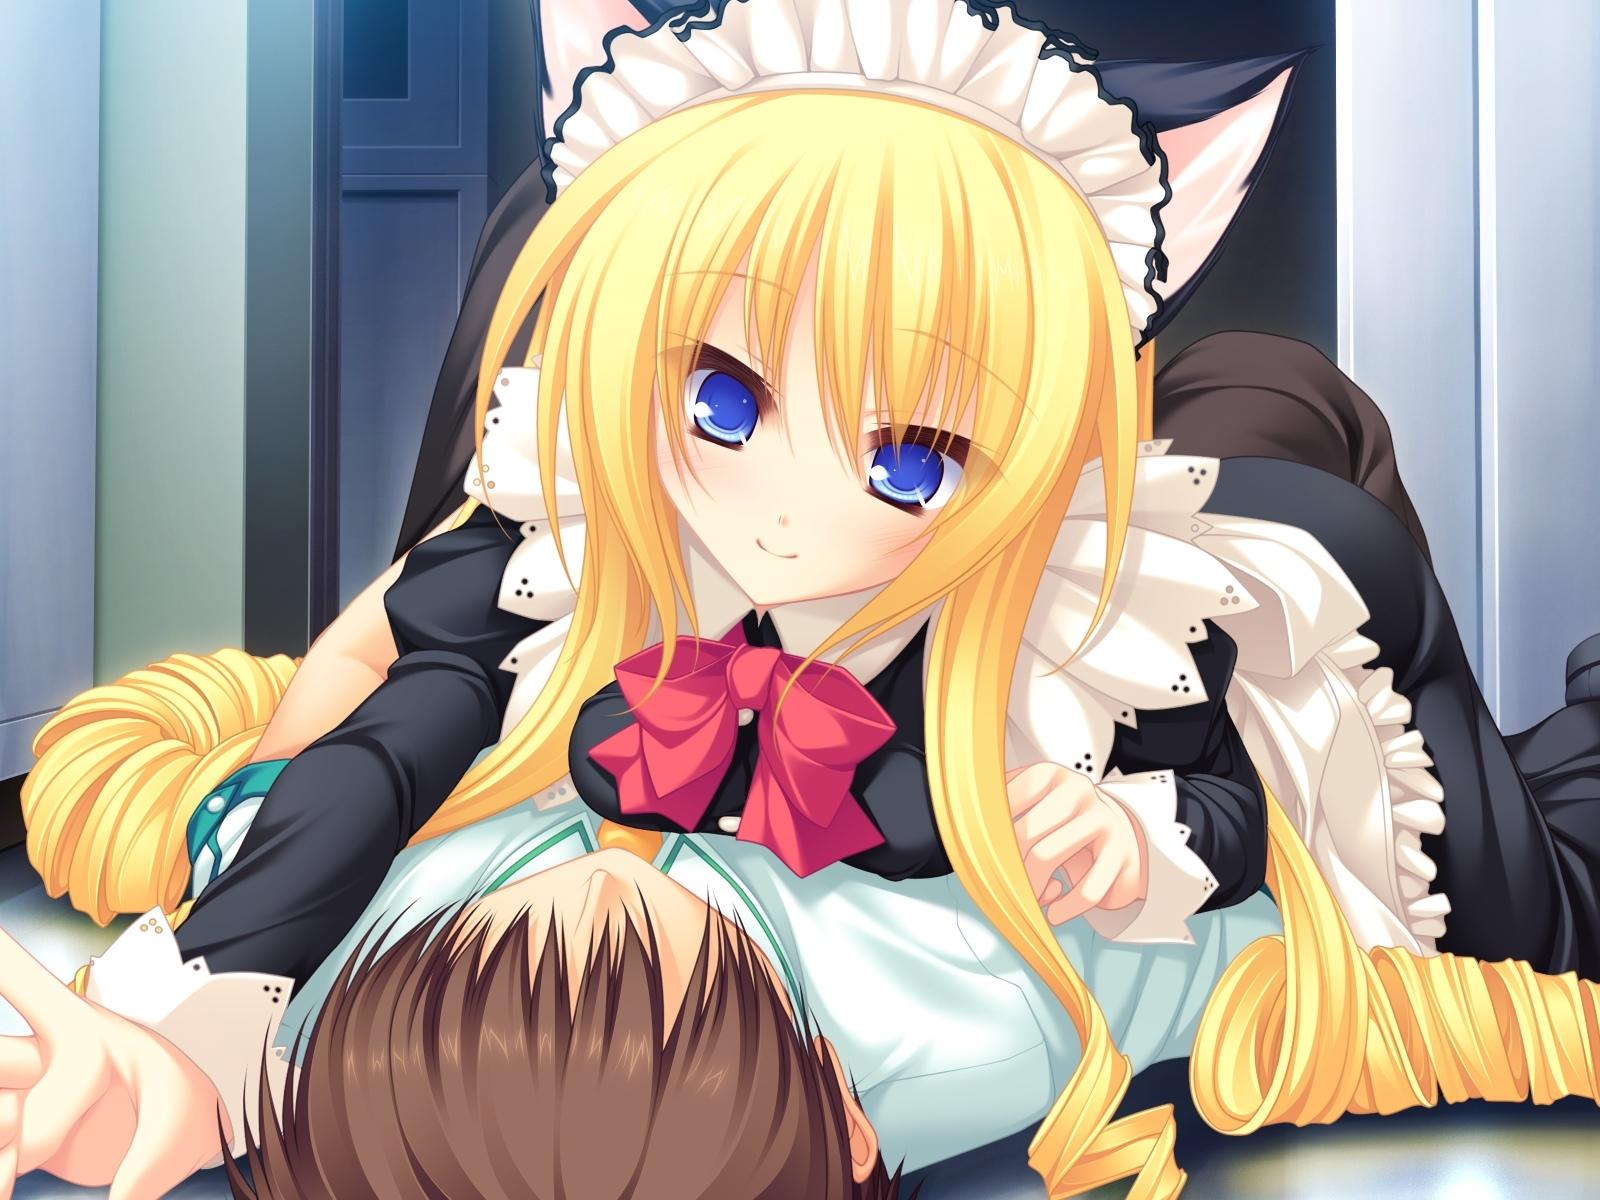 Wallpaper  Illustration, Blonde, Anime, Cartoon, Black